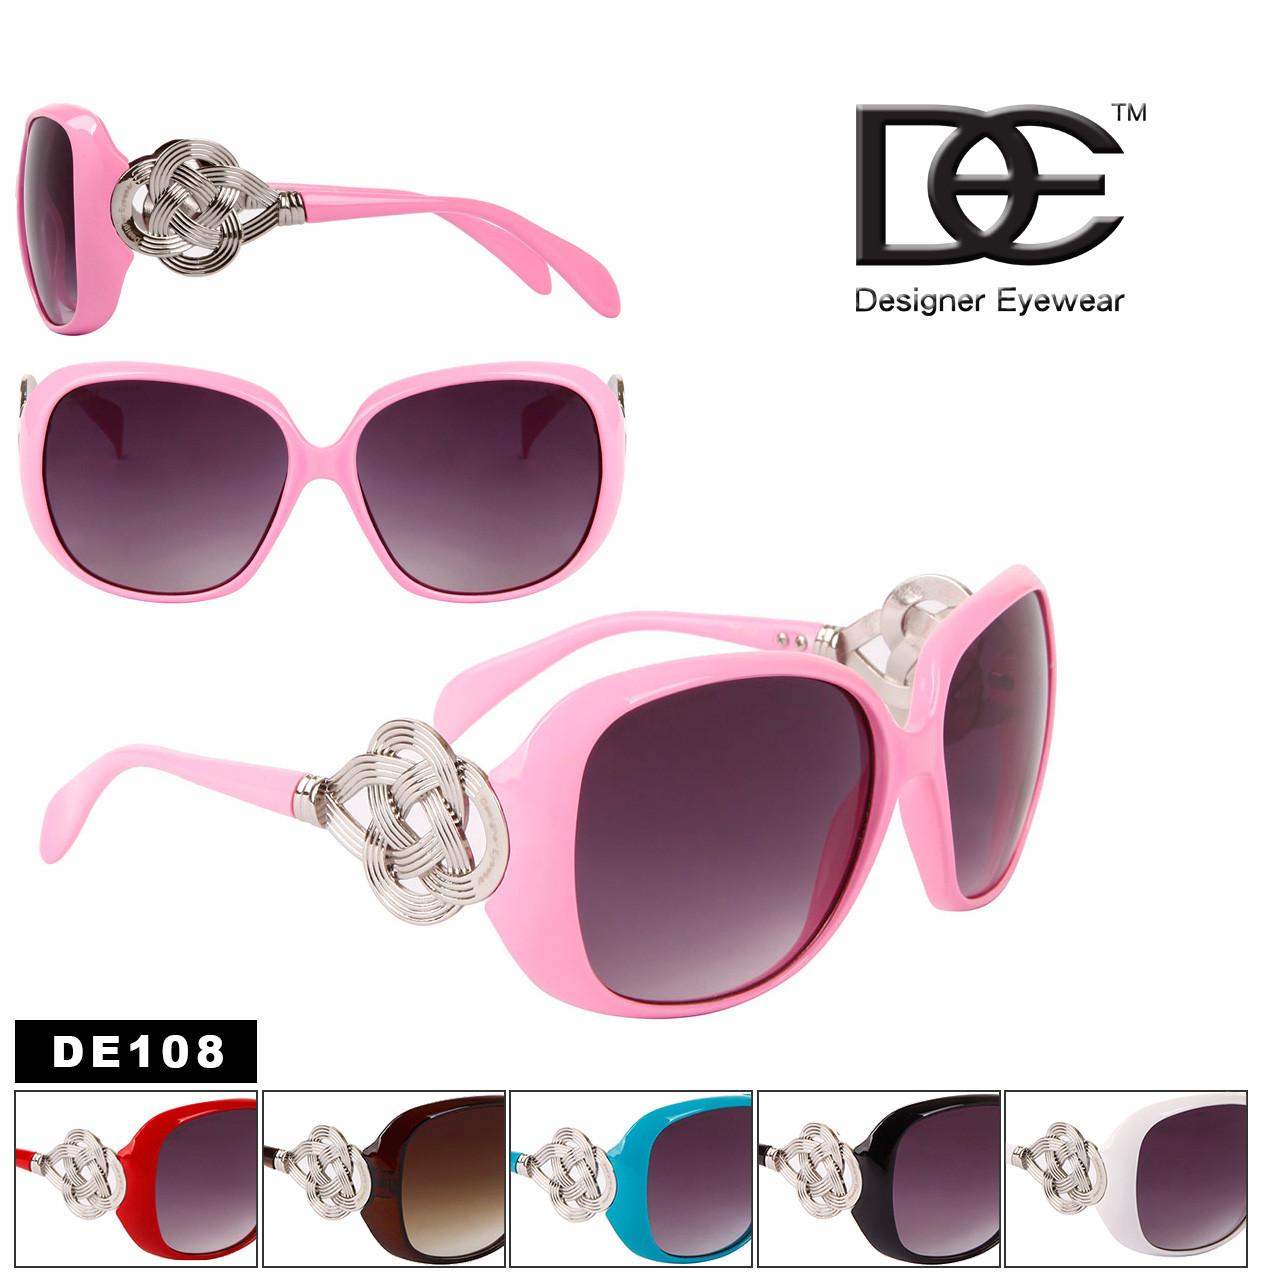 DE™ Designer Eyewear Fashion Sunglasses - Style #DE108